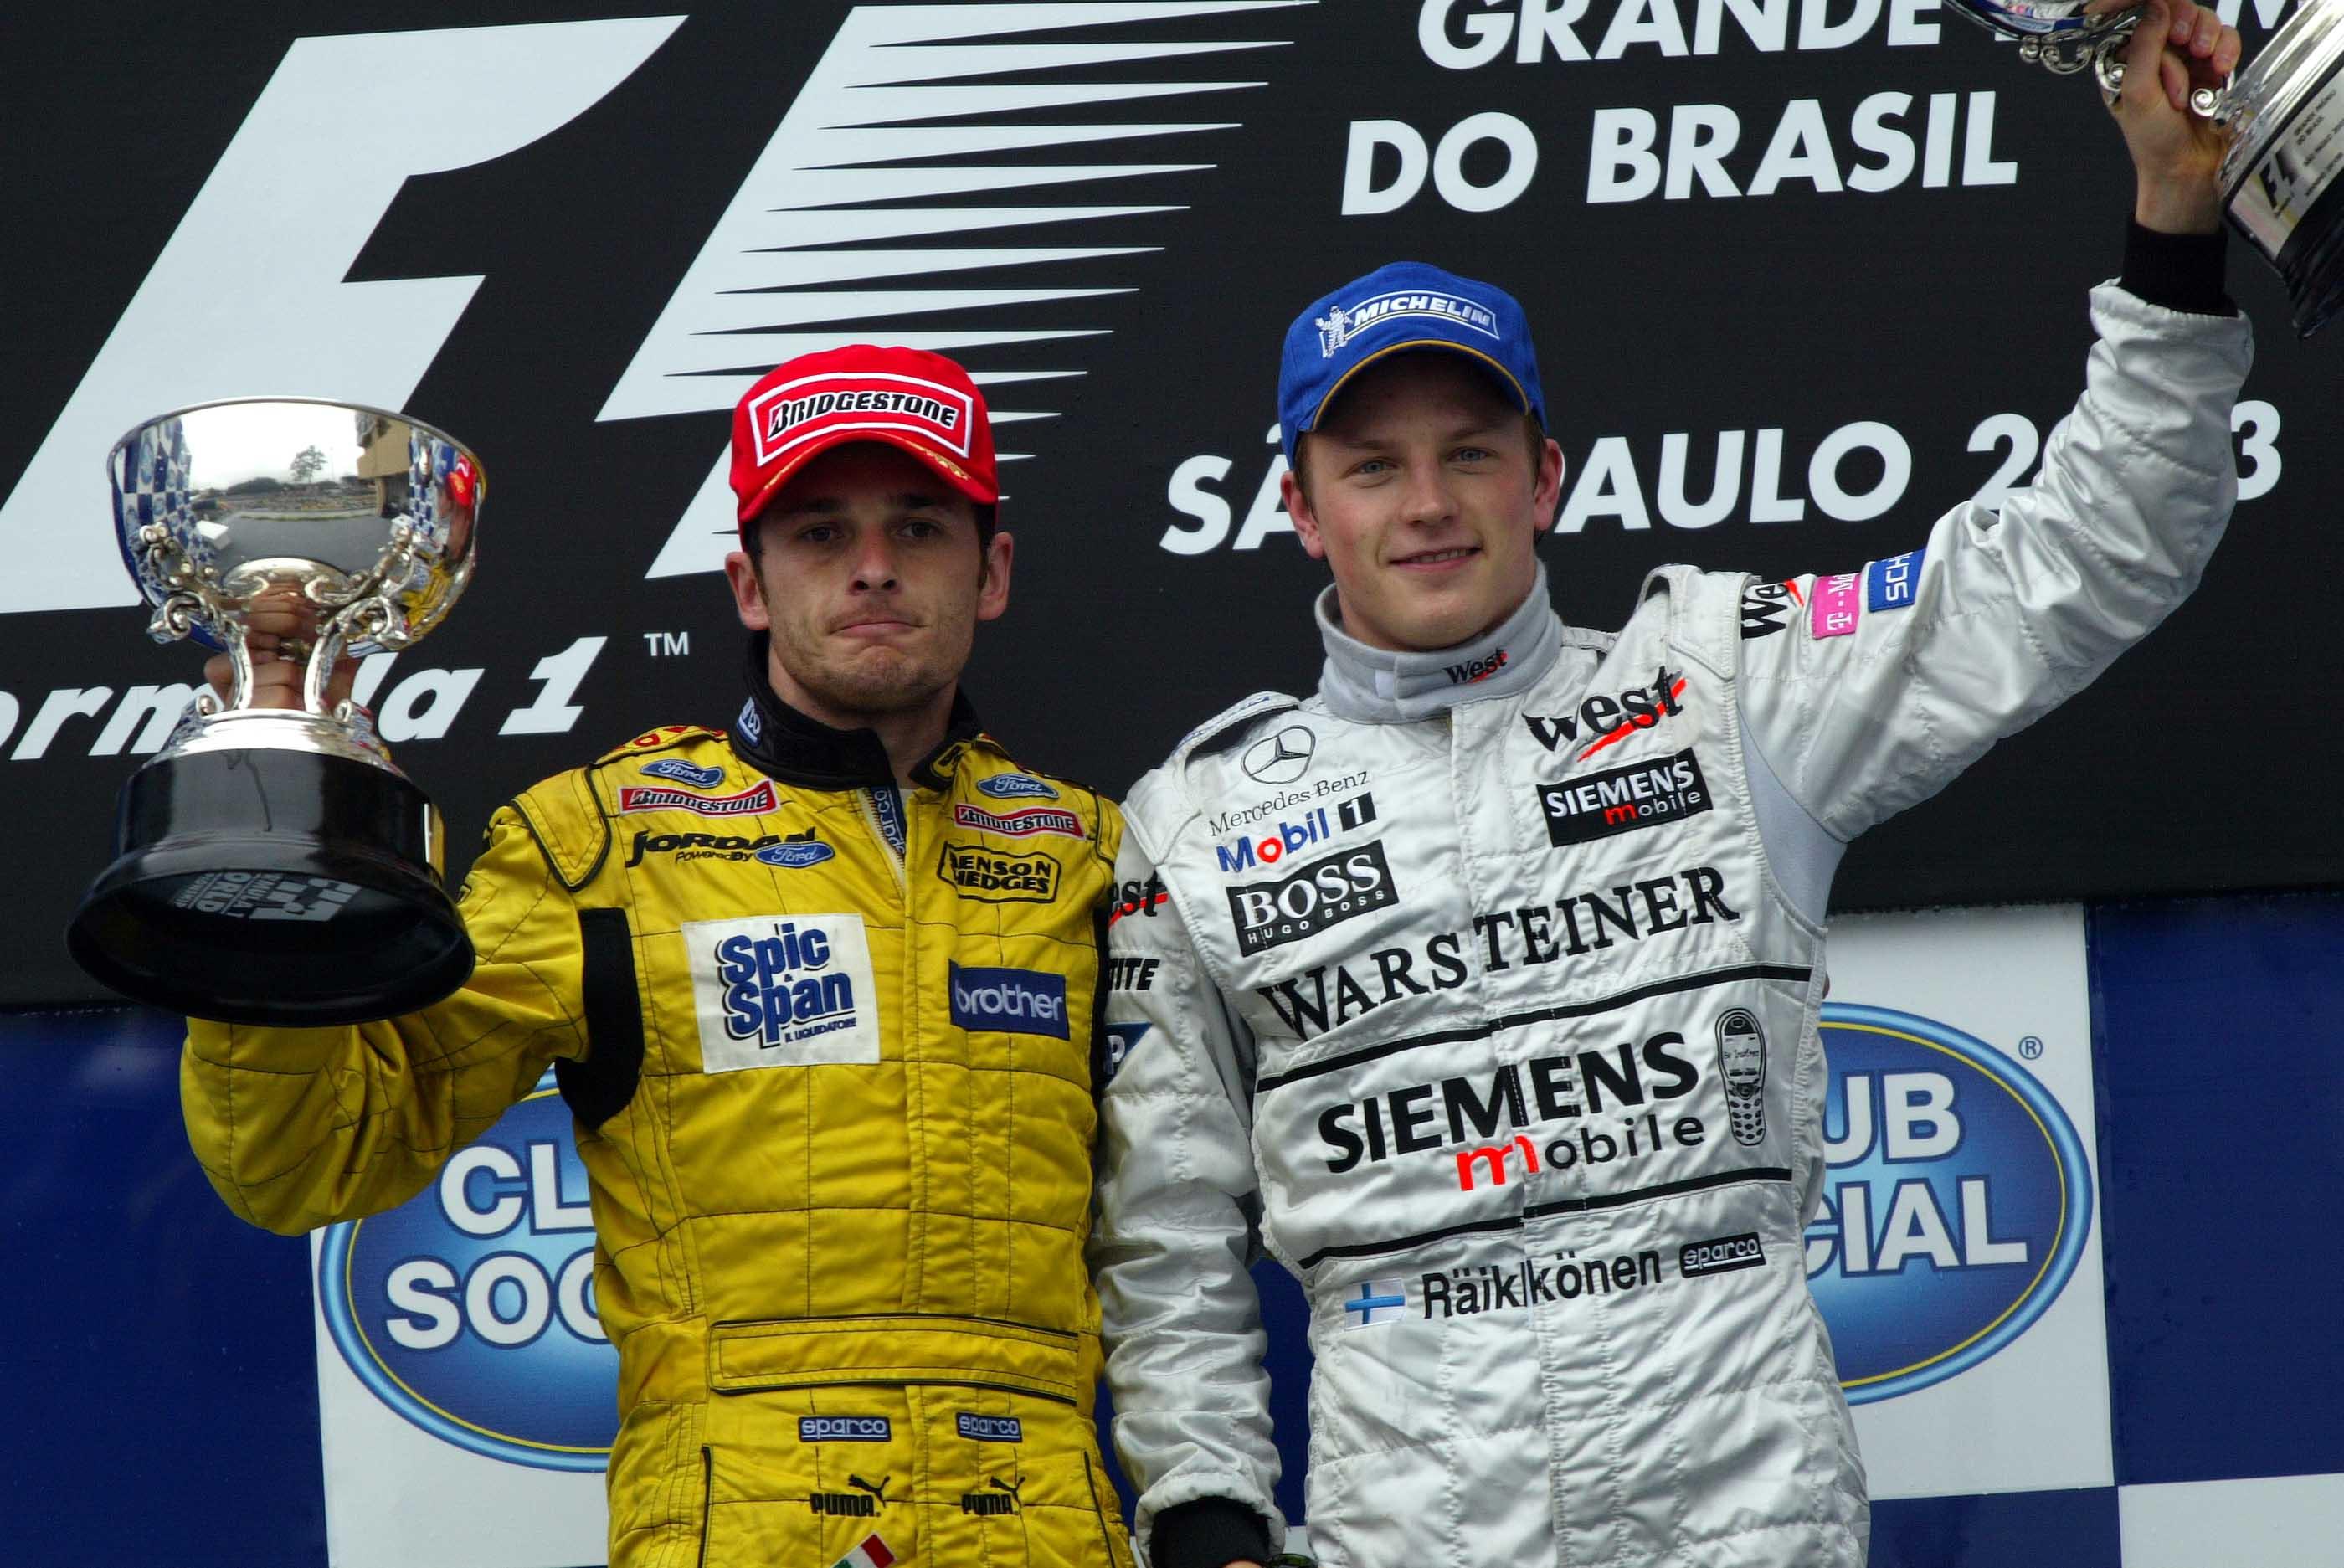 Sao Paolo, F1, So, Podium, Gf, Kr